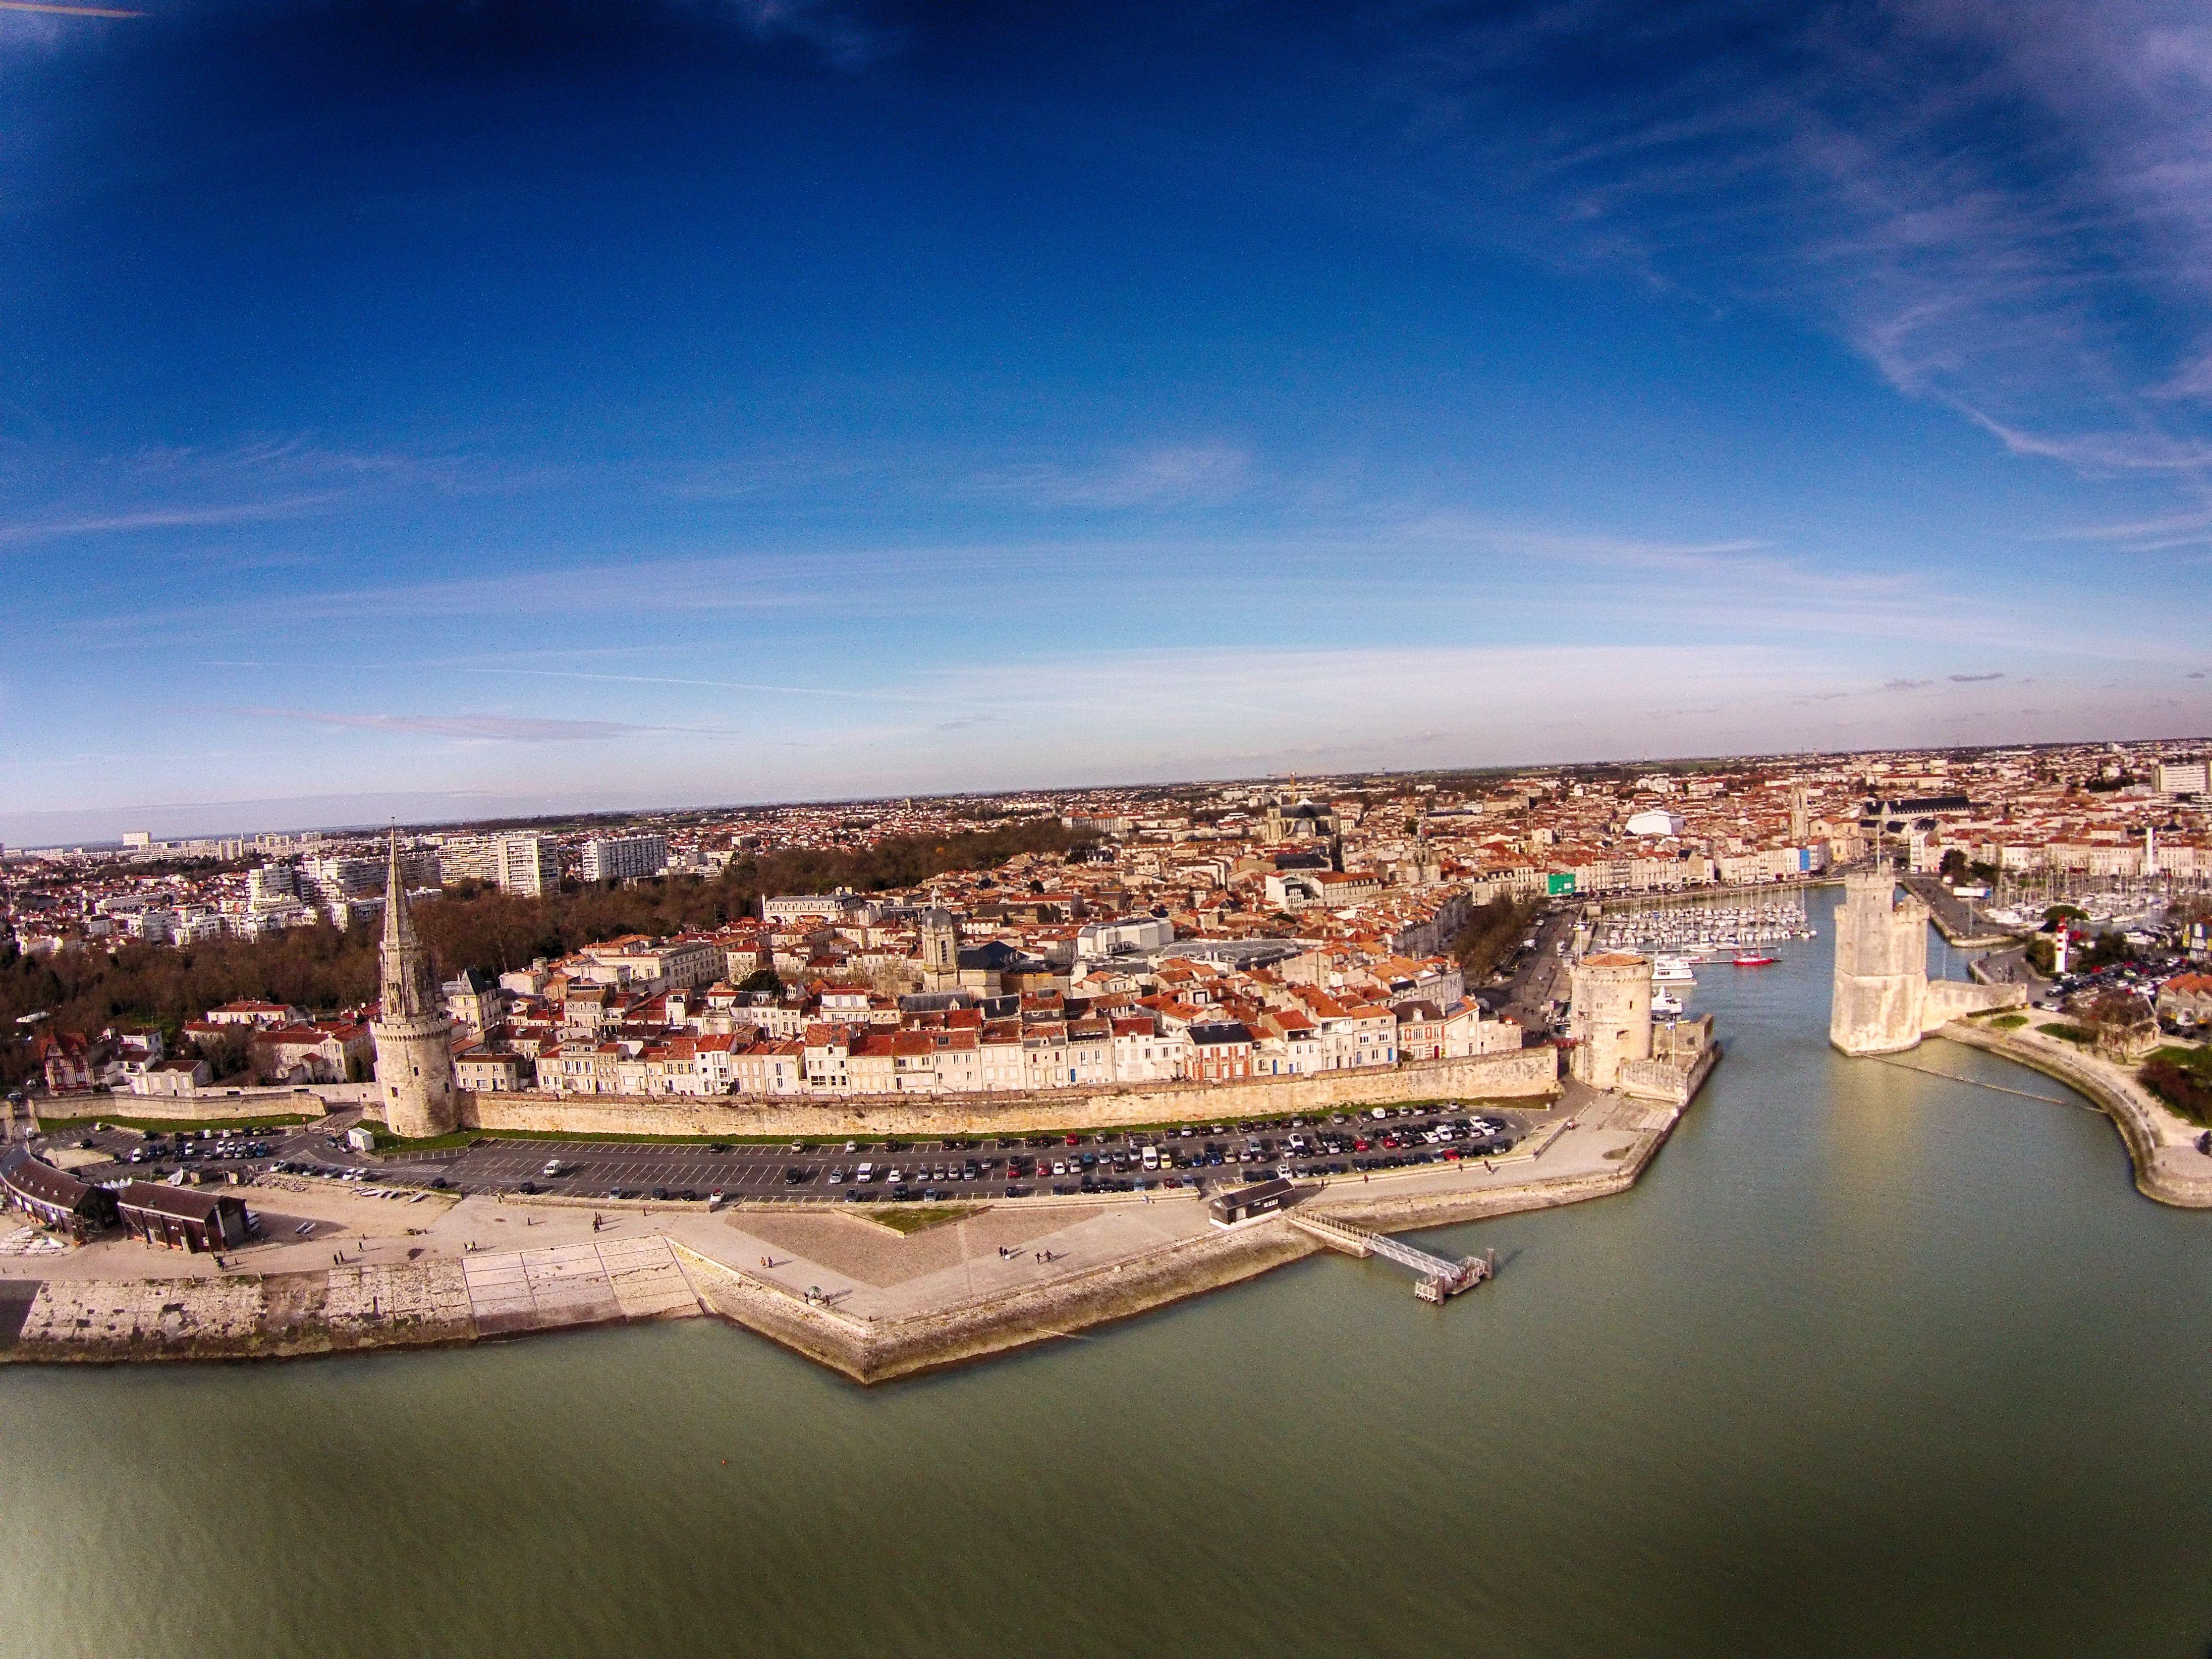 La Rochelle Quai avenue Michel Crepeau, La Rochelle,Charente-Maritime,France